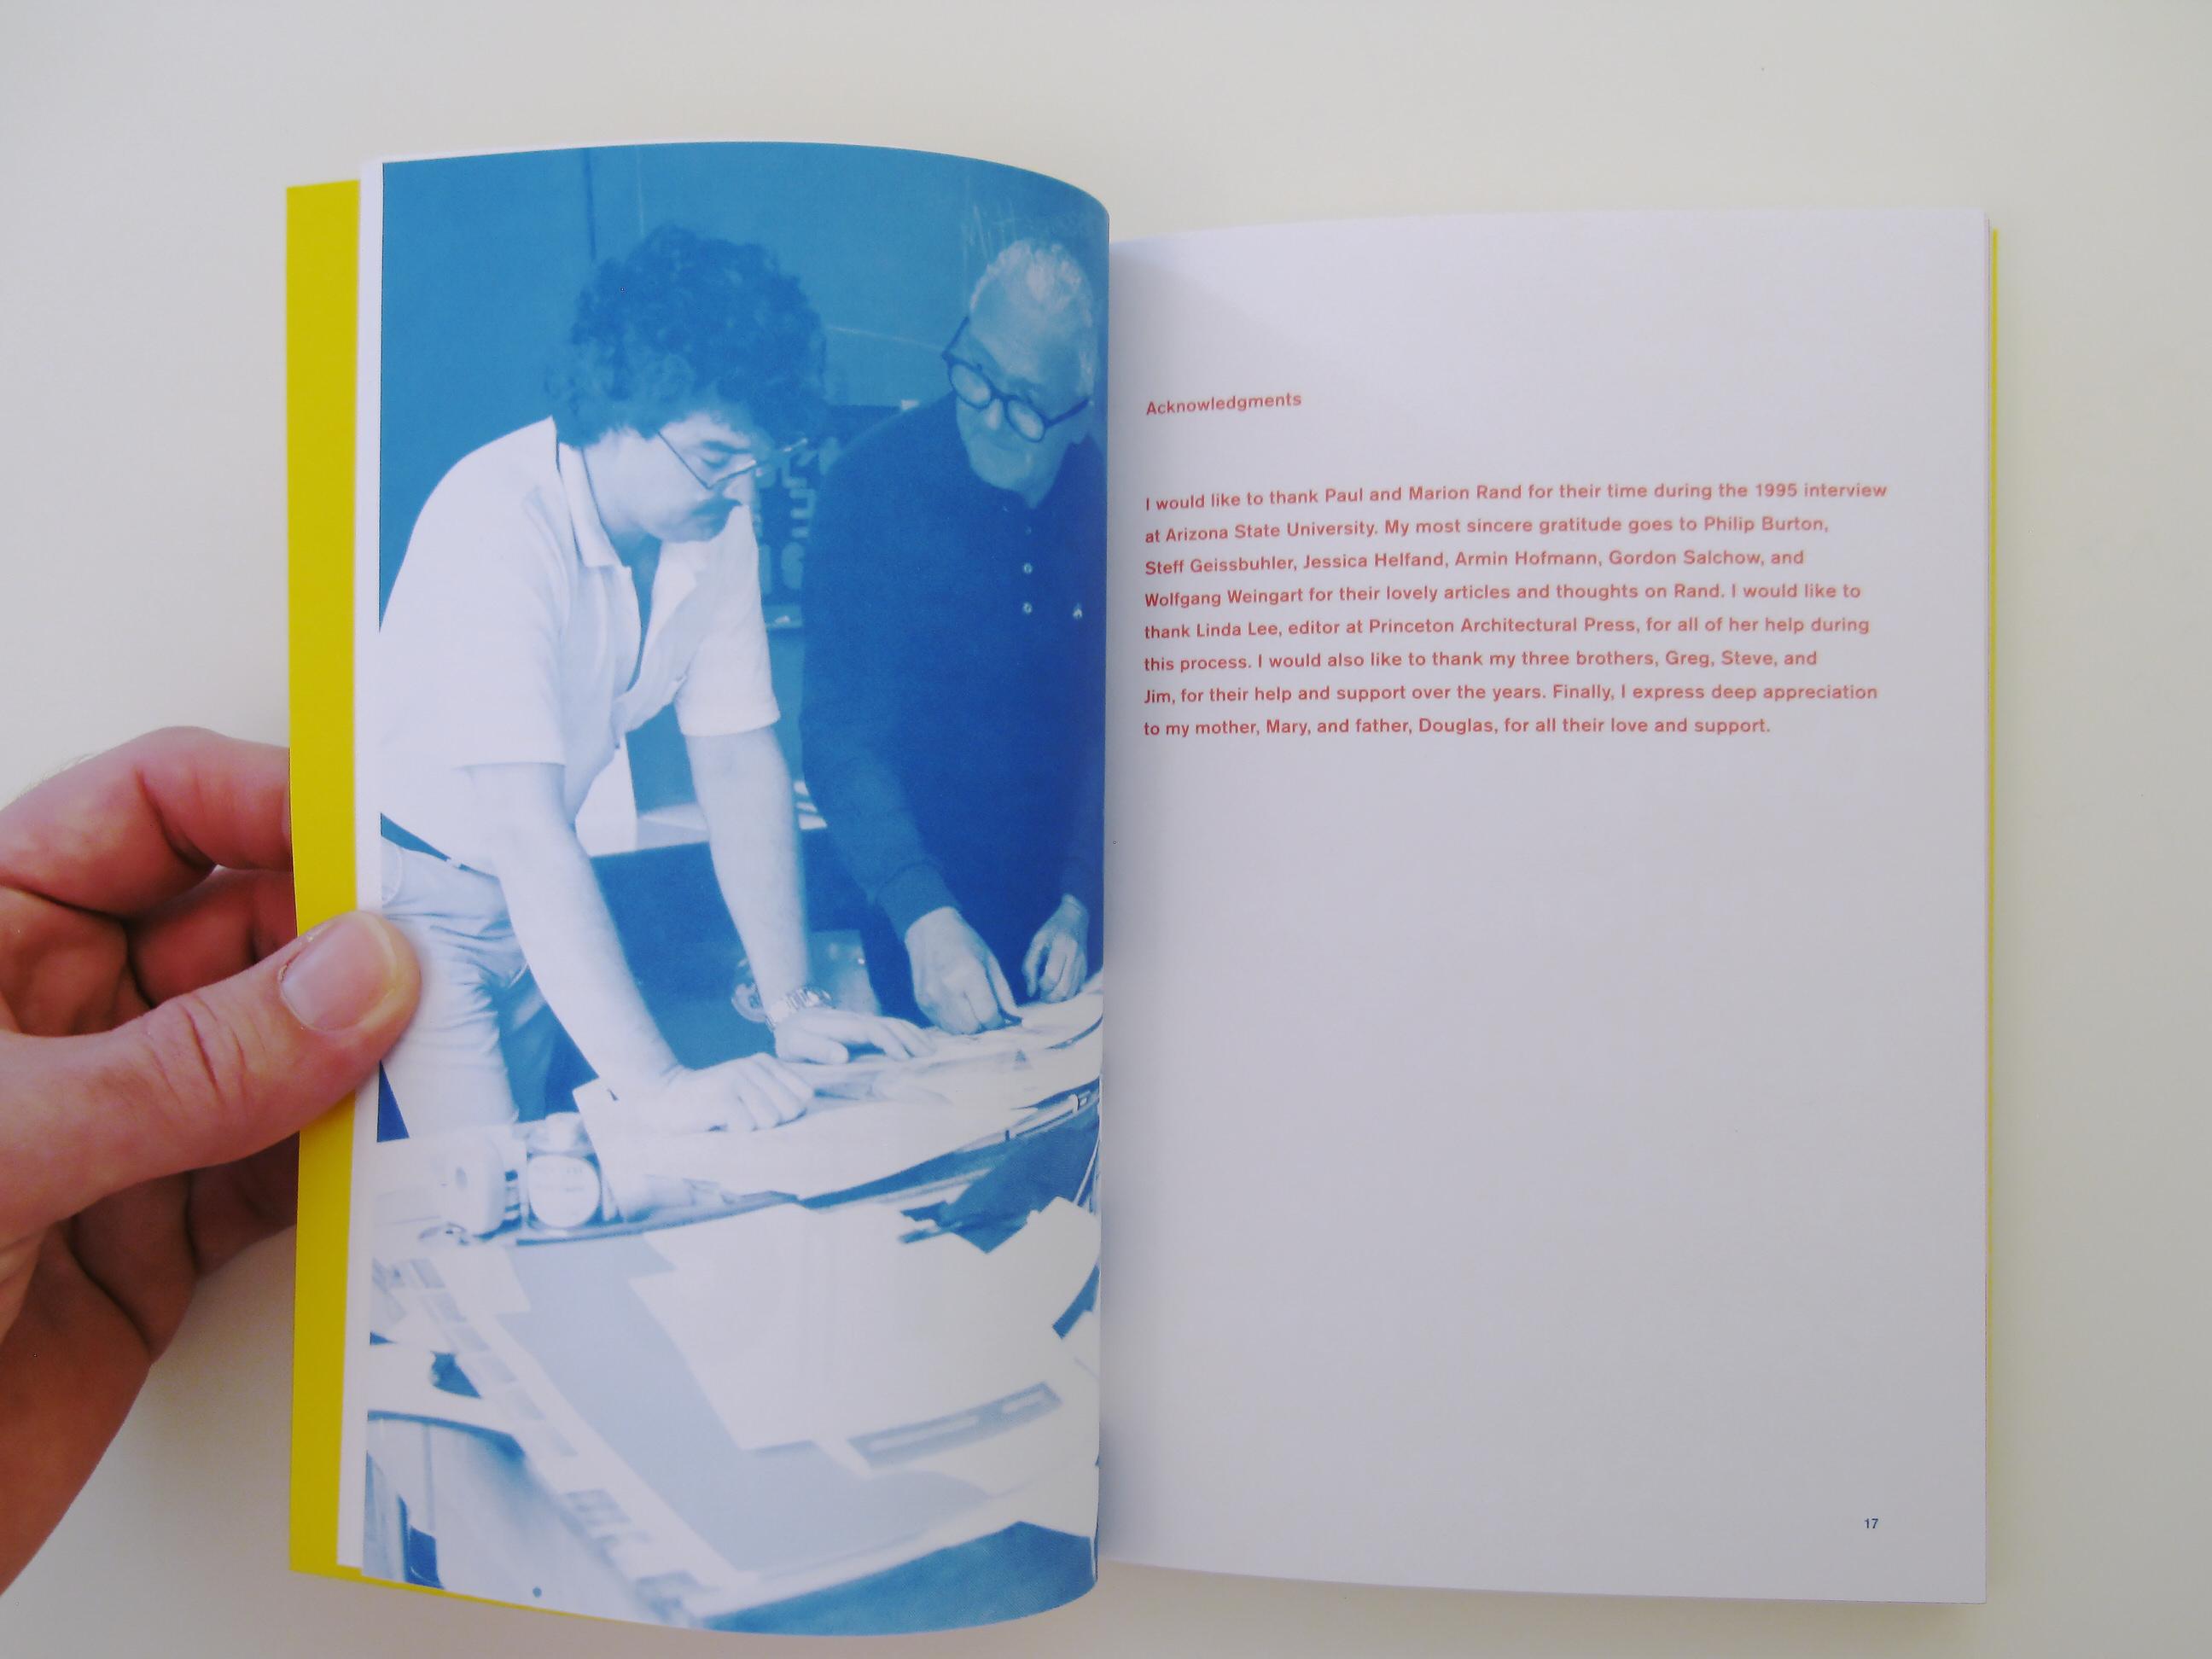 seventynine short essays on design essays kidakitap com